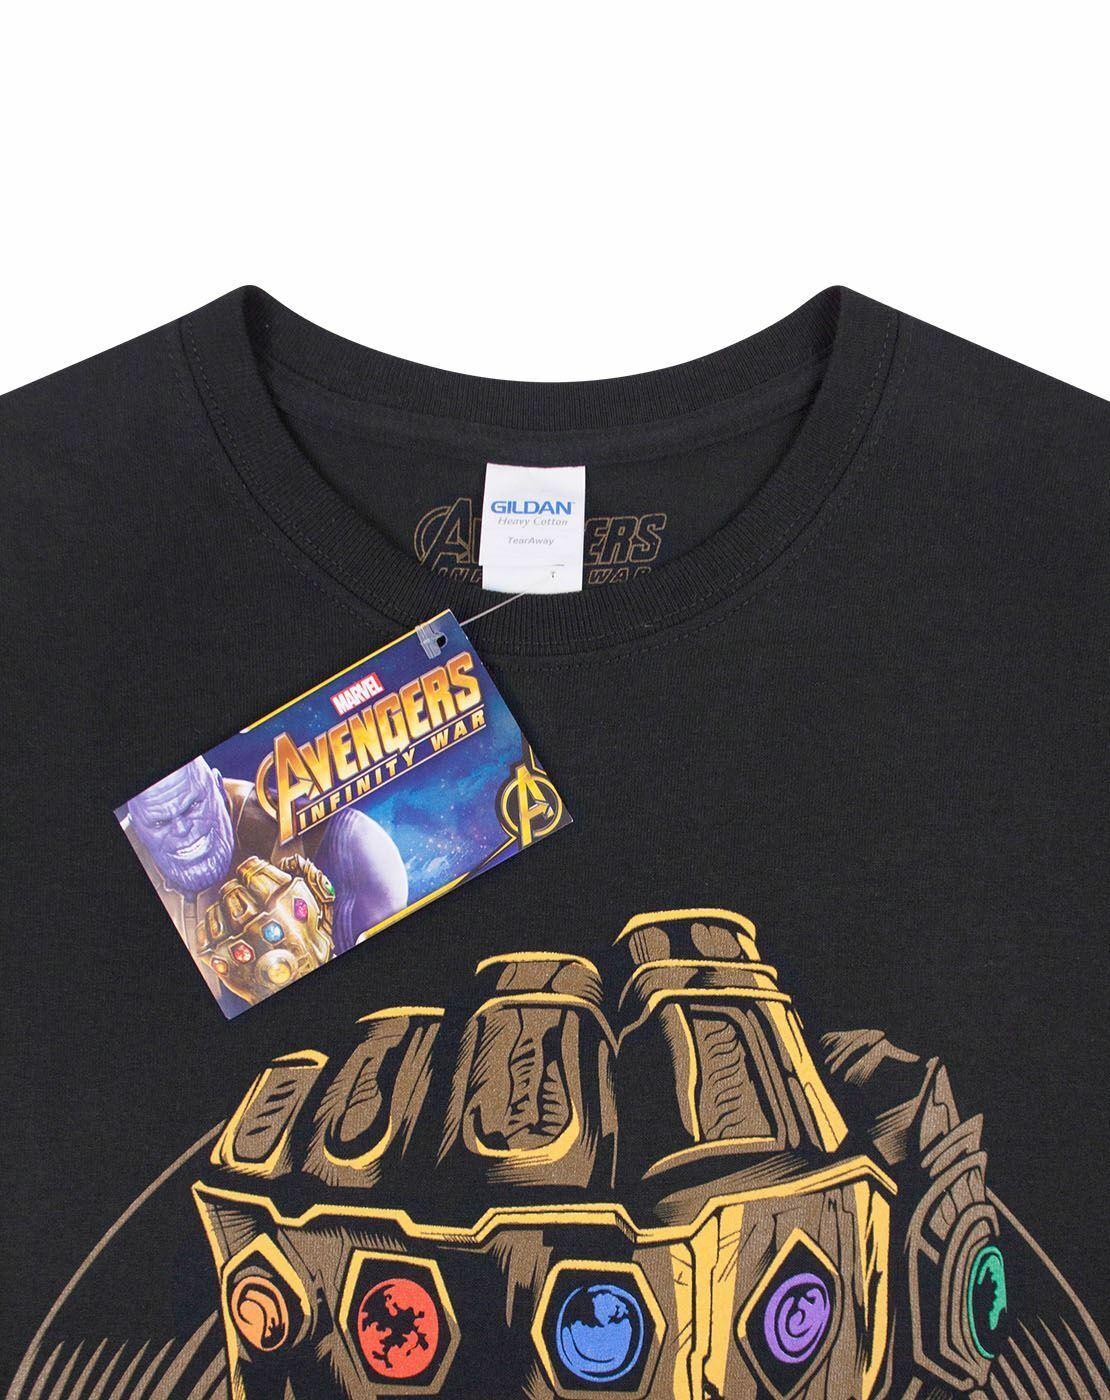 Avengers Endgame Infinity Gauntlet Men/'s Purple T-Shirt